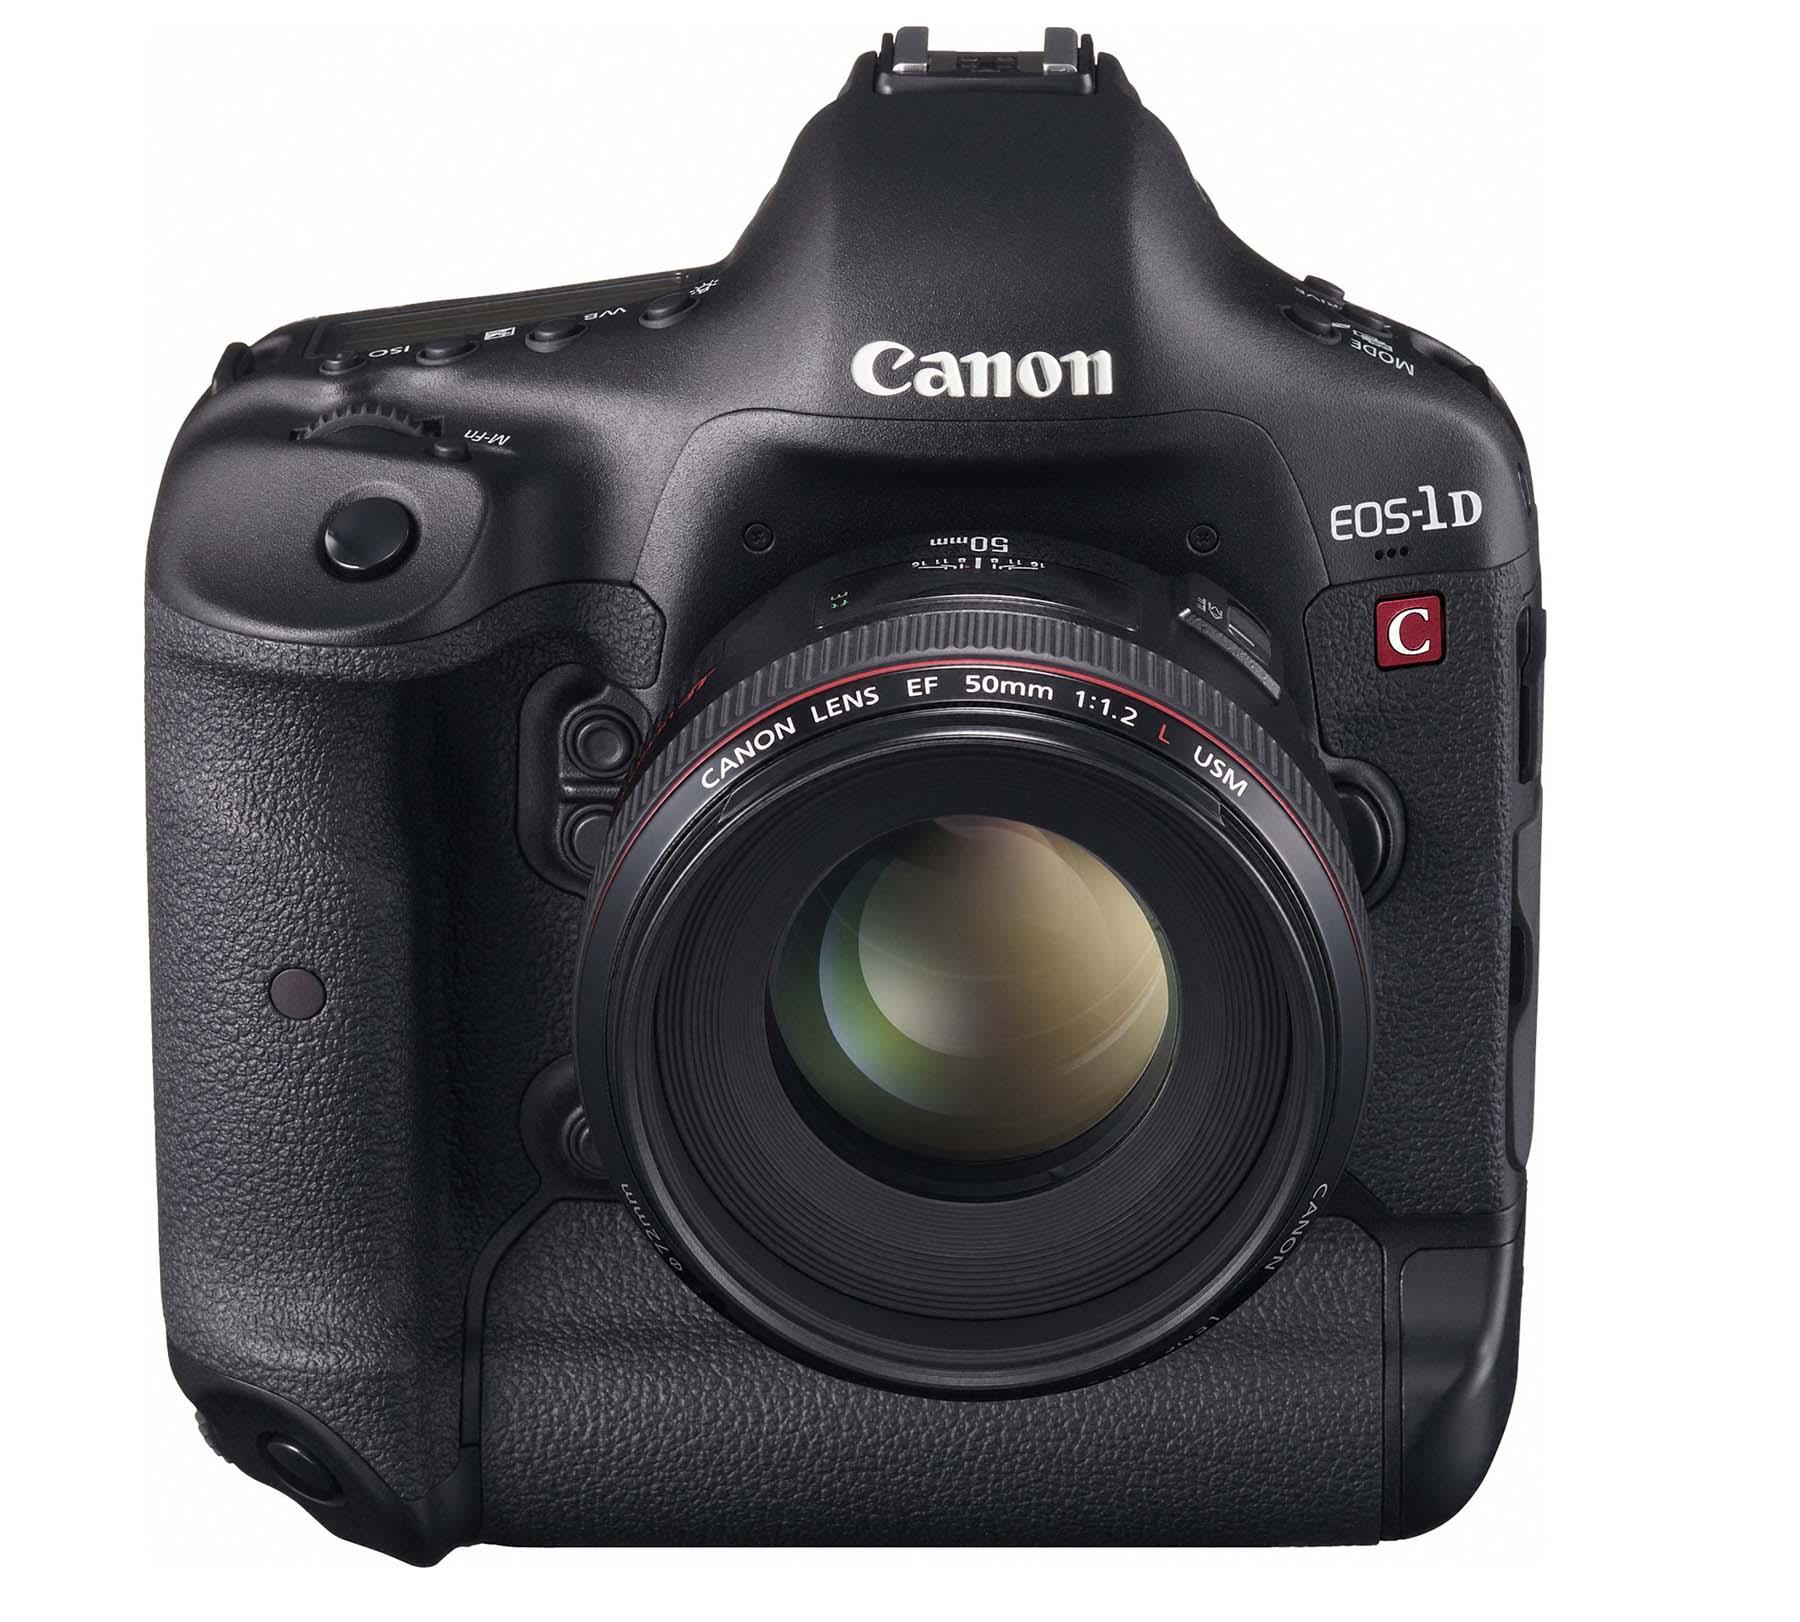 canon-eos-1d-c-jjc.jpeg